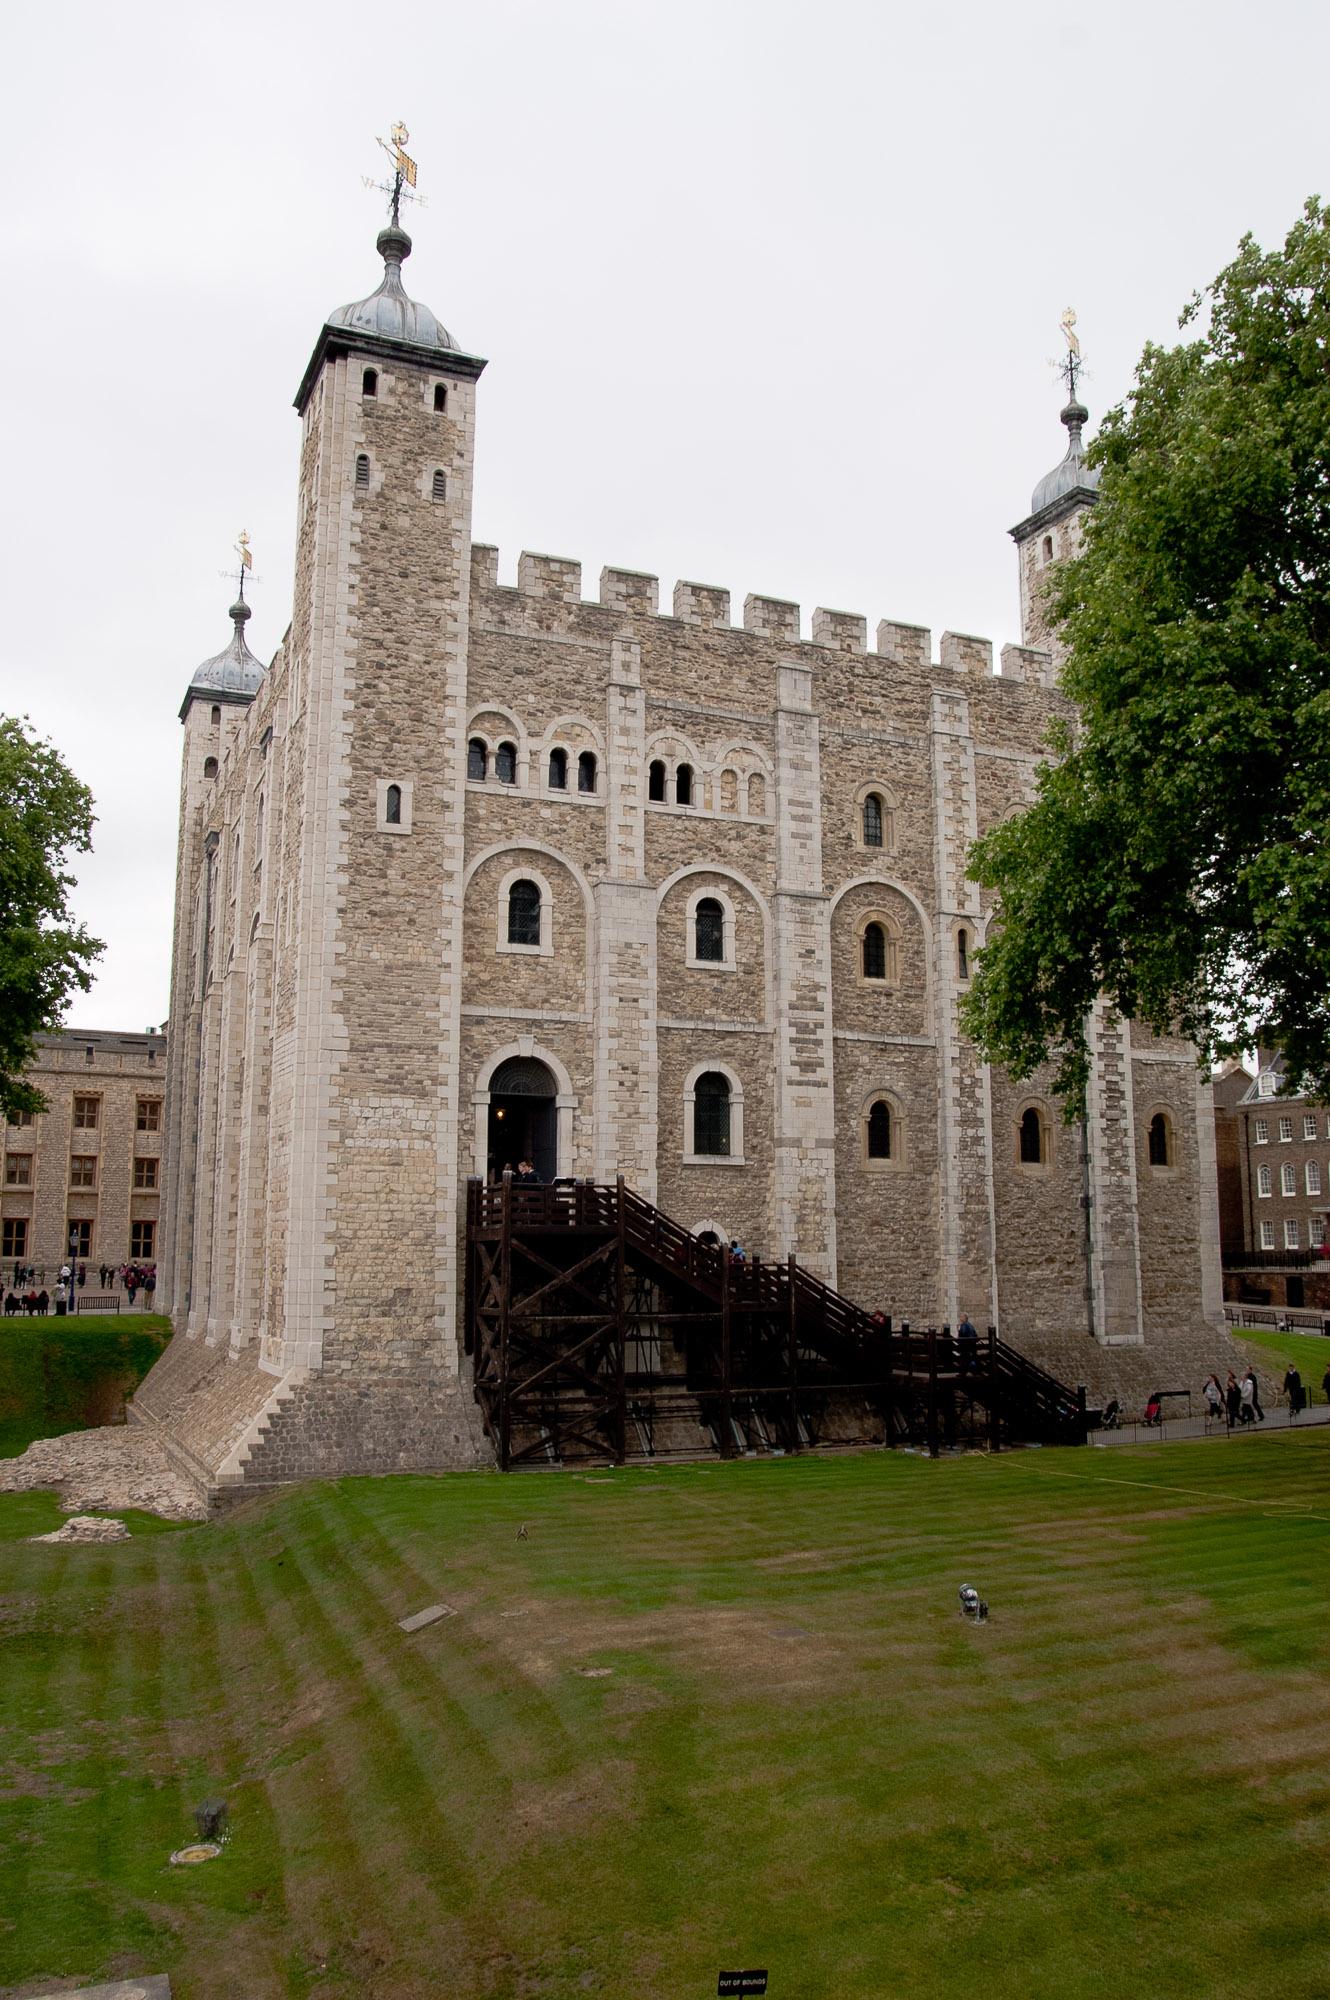 Tower IV